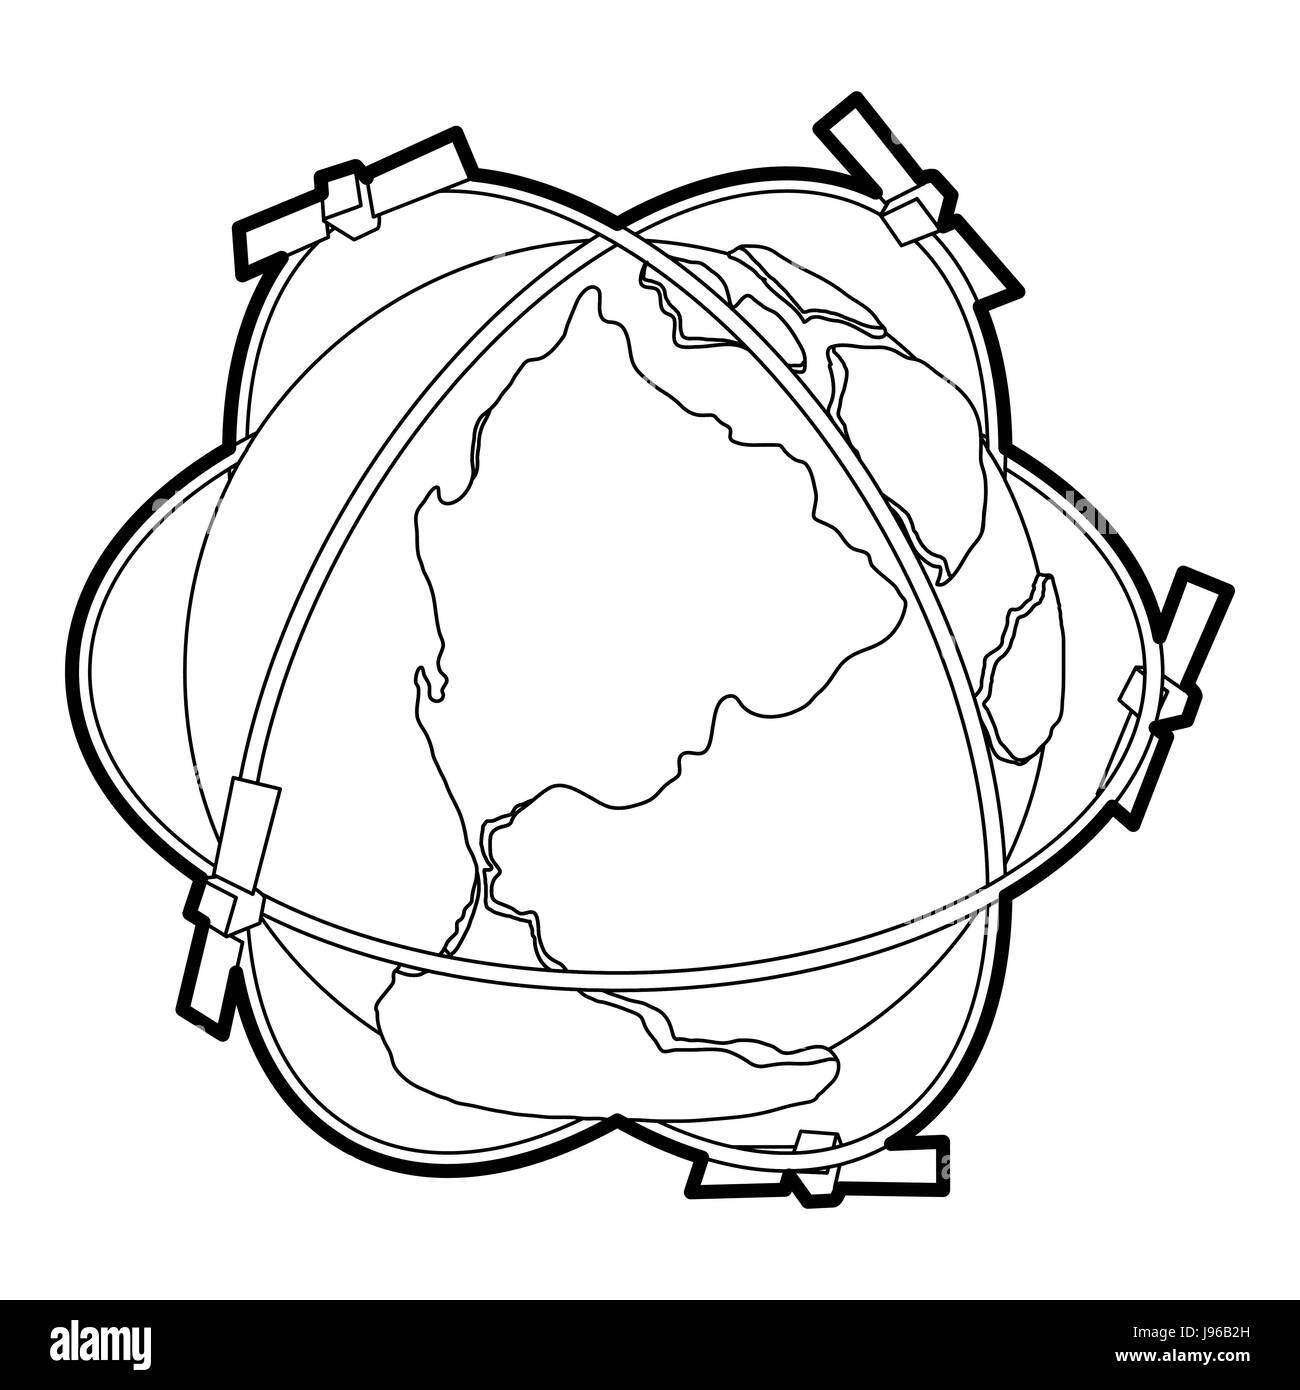 satellite orbit around earth stock photos satellite orbit around 1st Russian Sattelite satellite system around earth icon outline style stock image